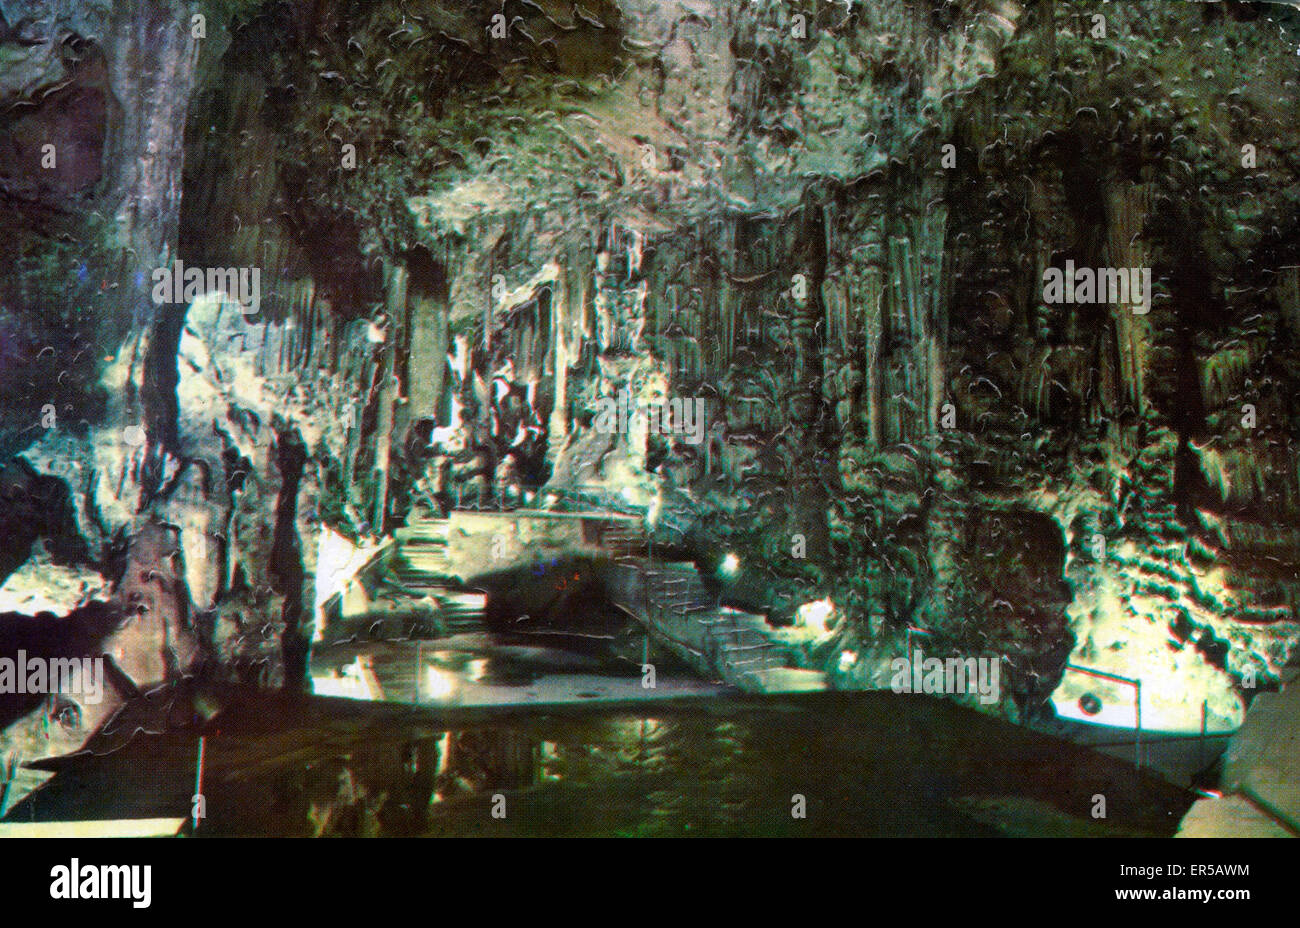 Caves, Awaiting Identification, . - Stock Image